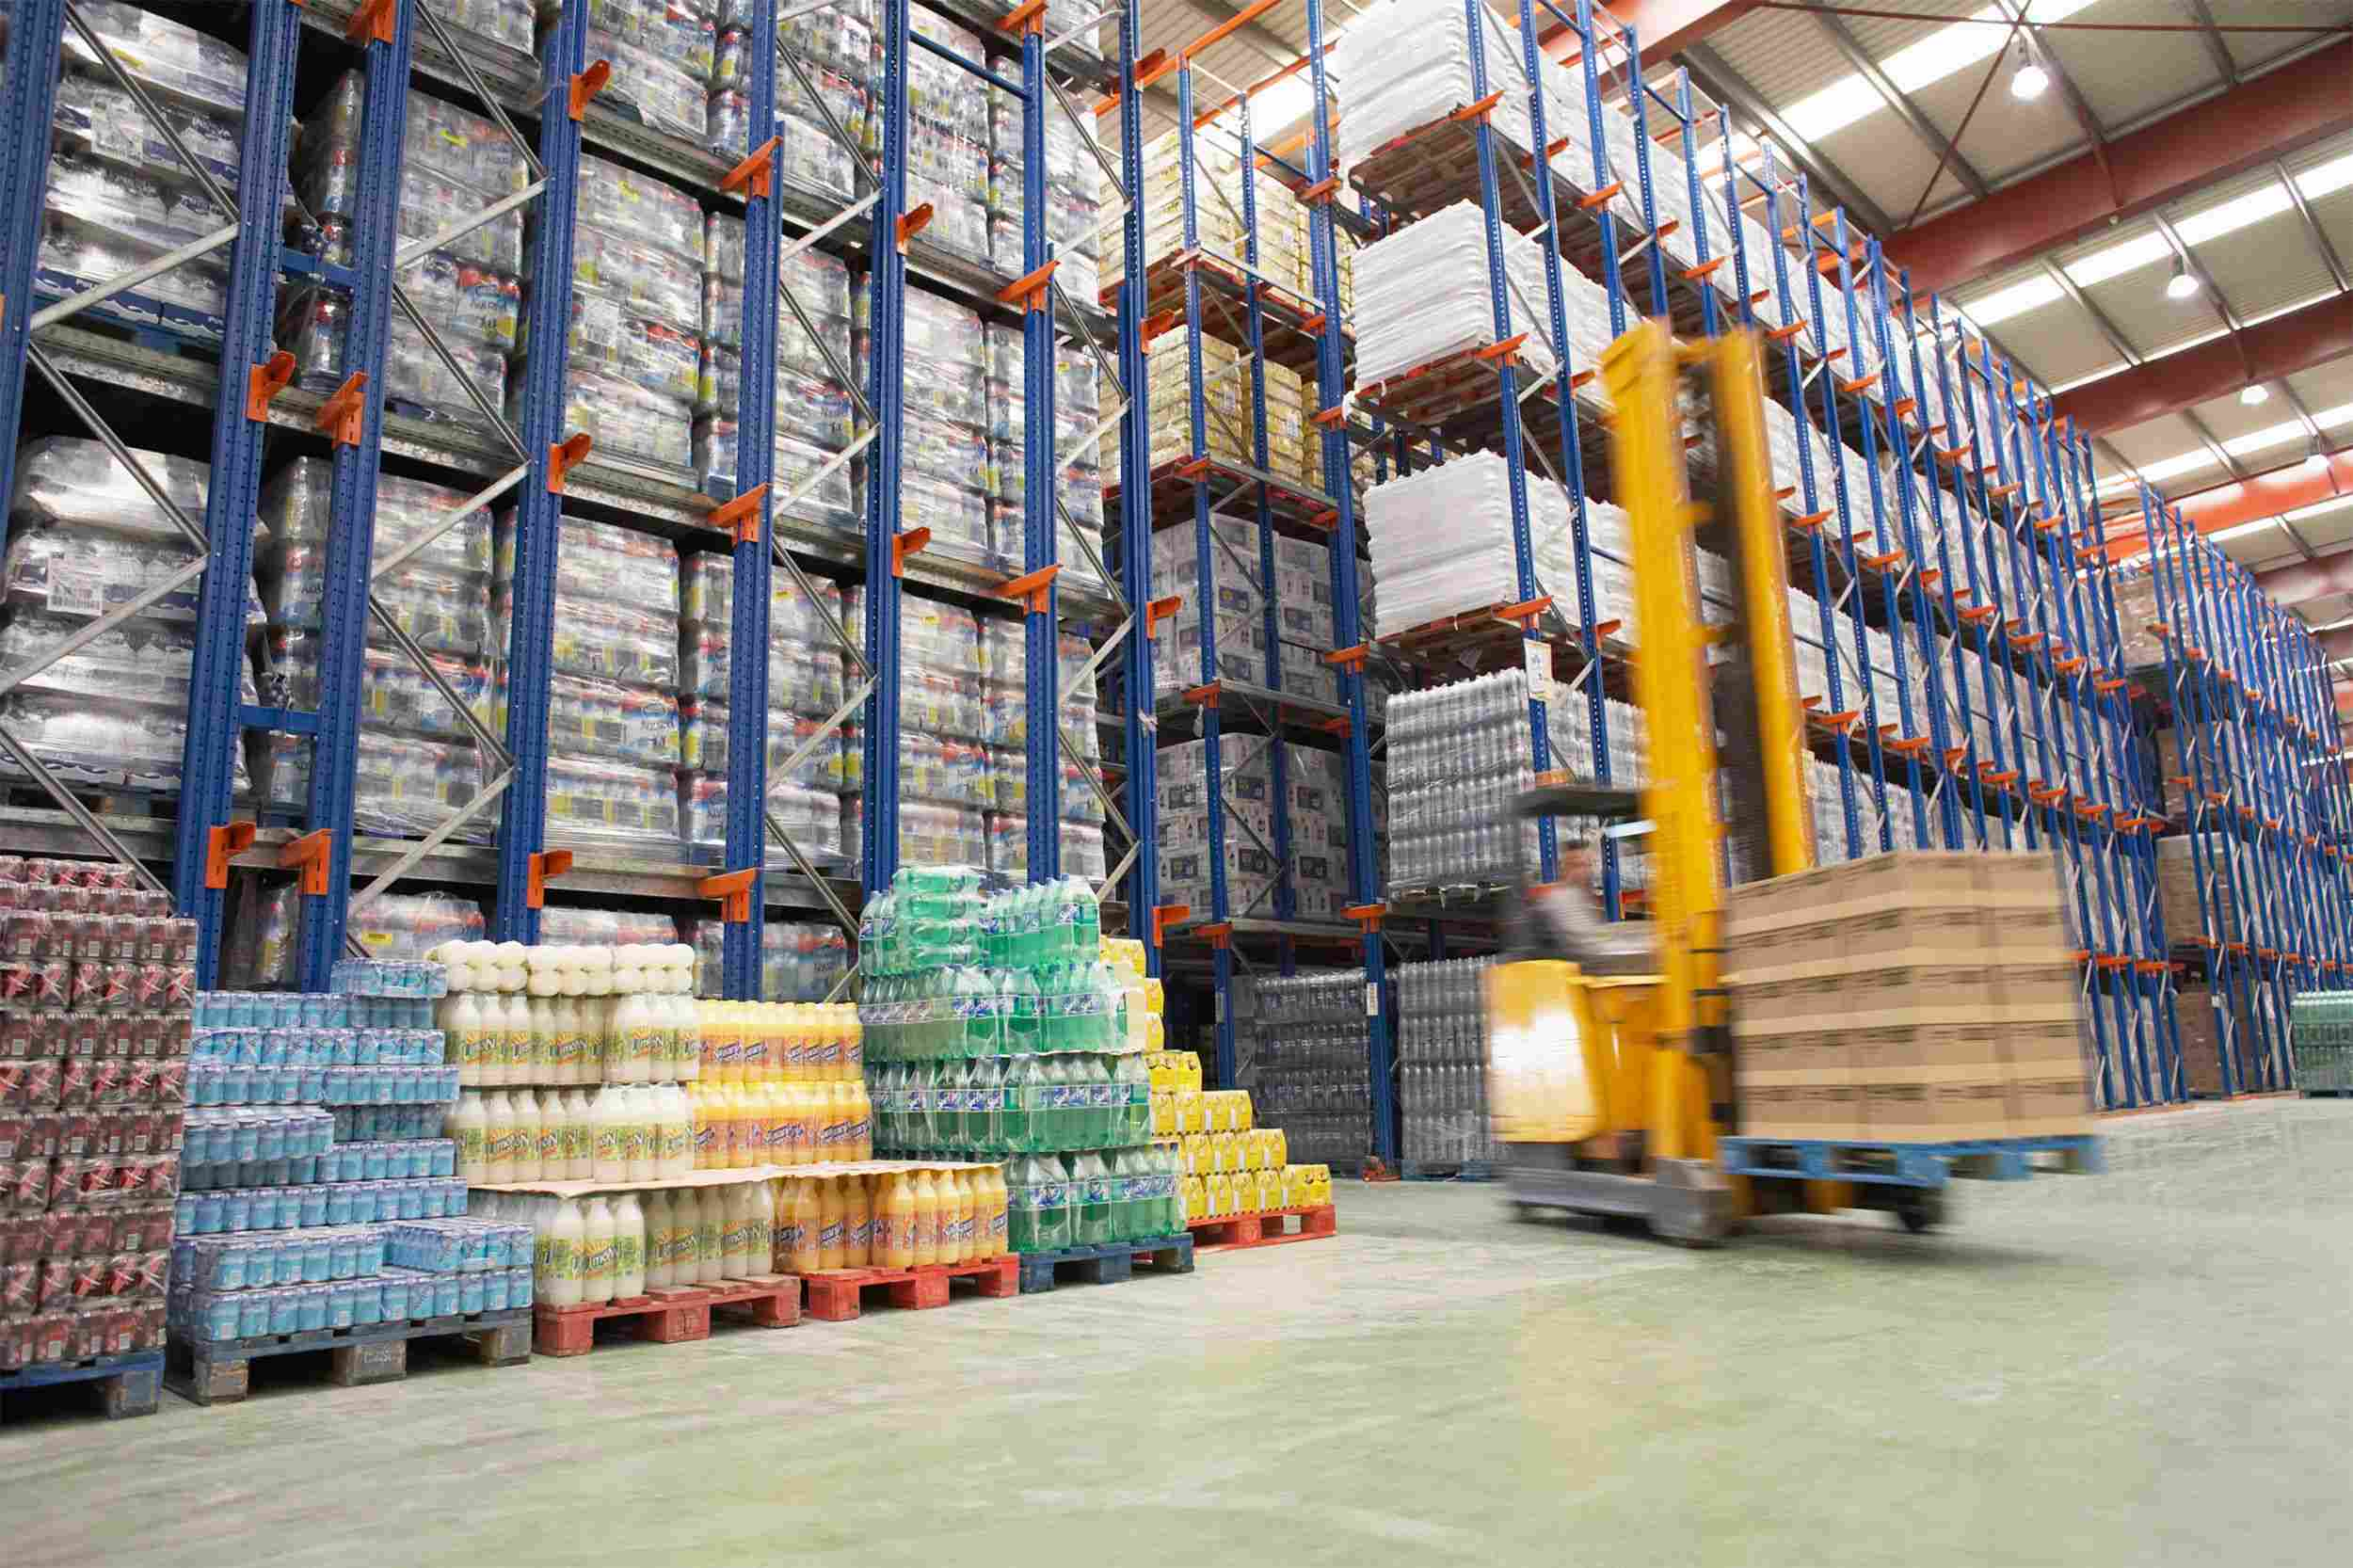 https://balistlogistic.com/wp-content/uploads/2015/09/Warehouse-and-lifter.jpg